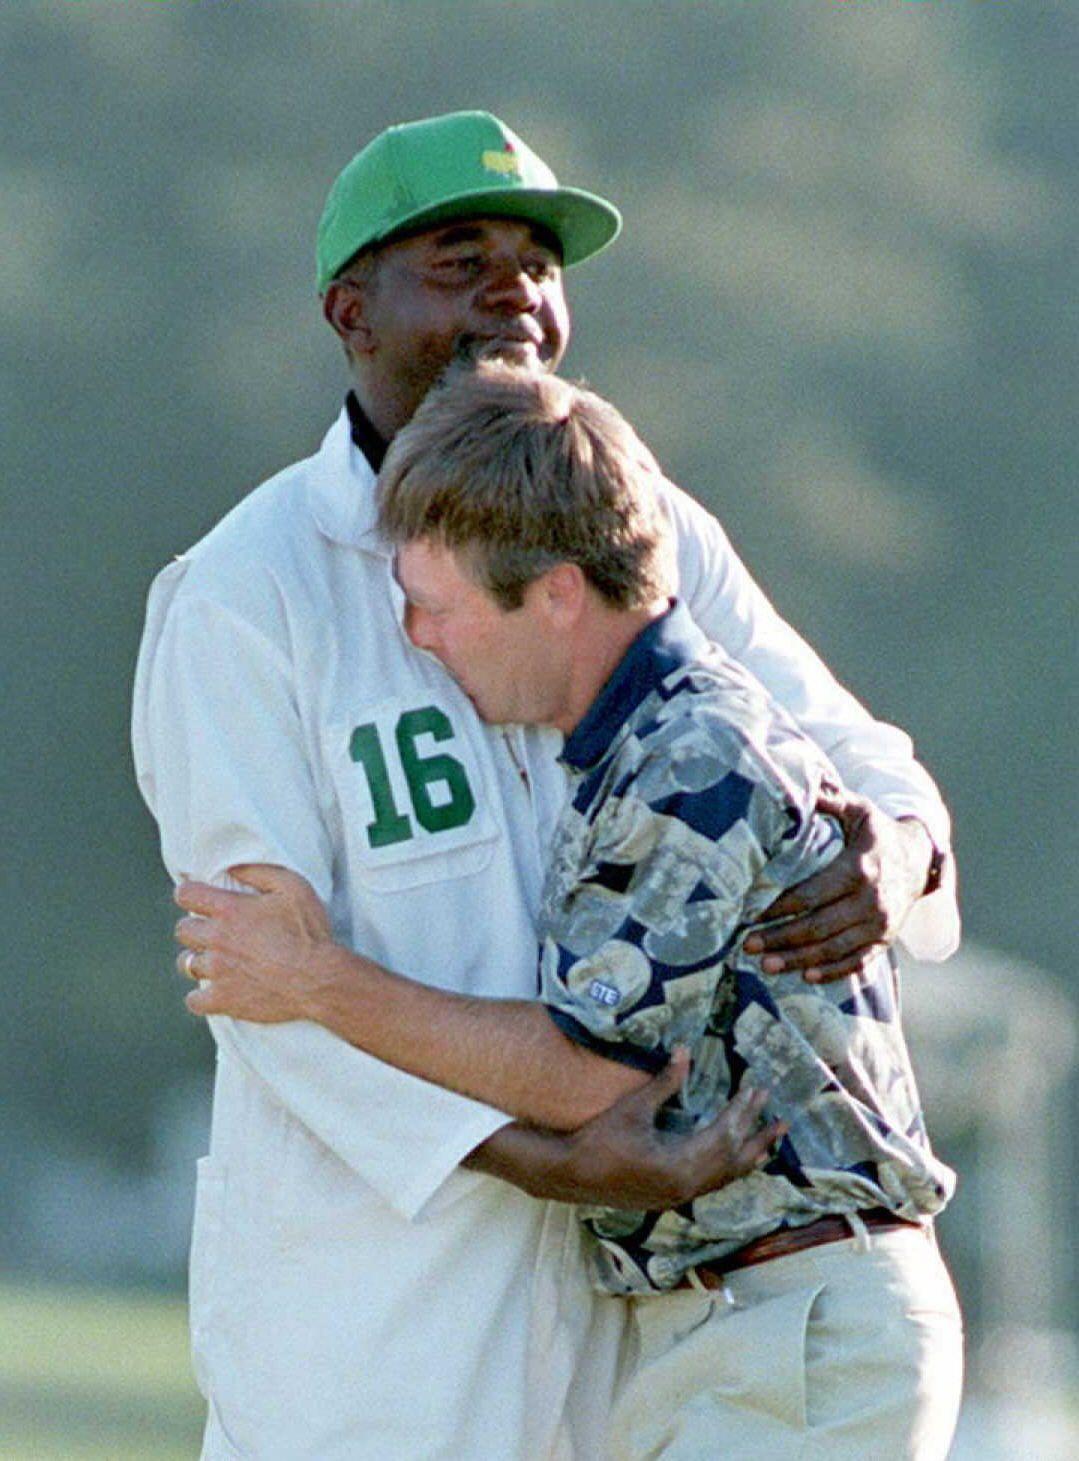 8afdaf1079d Ben Crenshaw - 1995 Masters Champion hugging his caddy ...